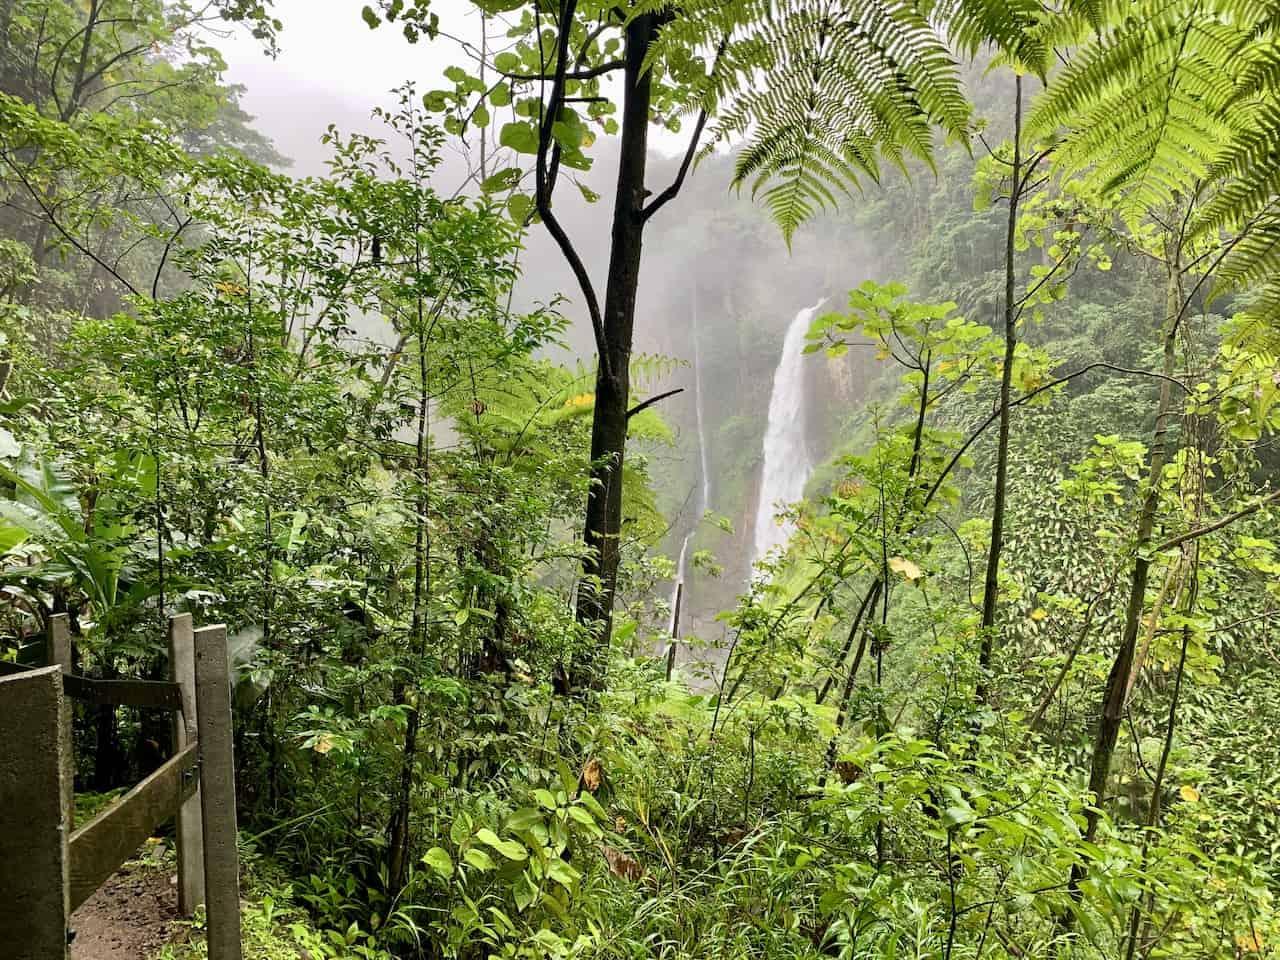 Catarata del Toro Rainforest